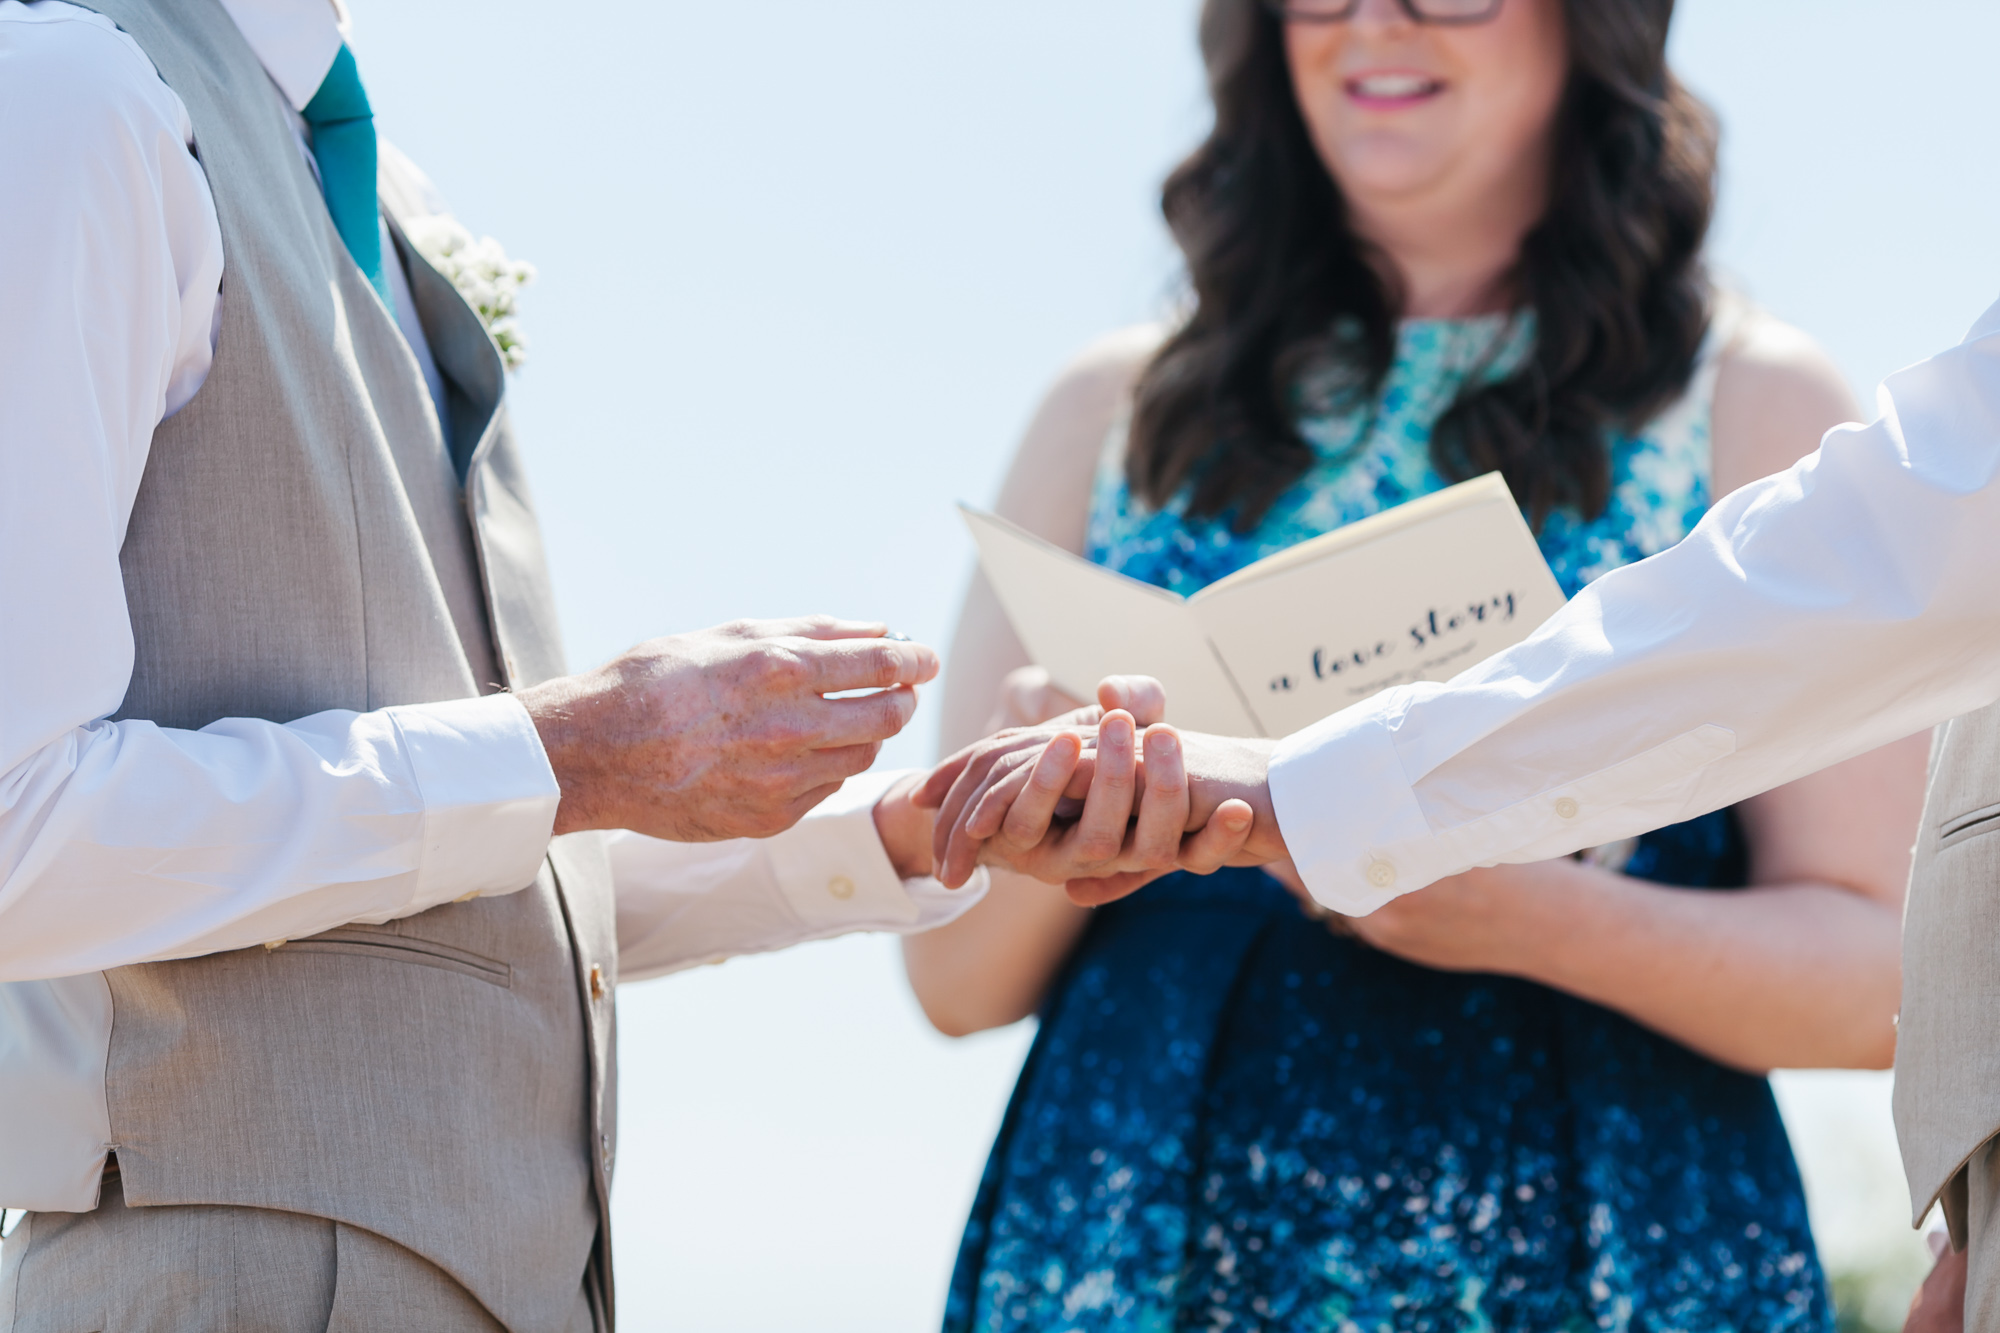 18_Cambria_wedding_samesex_coastal_intimate_Central_Coast_beach.jpg